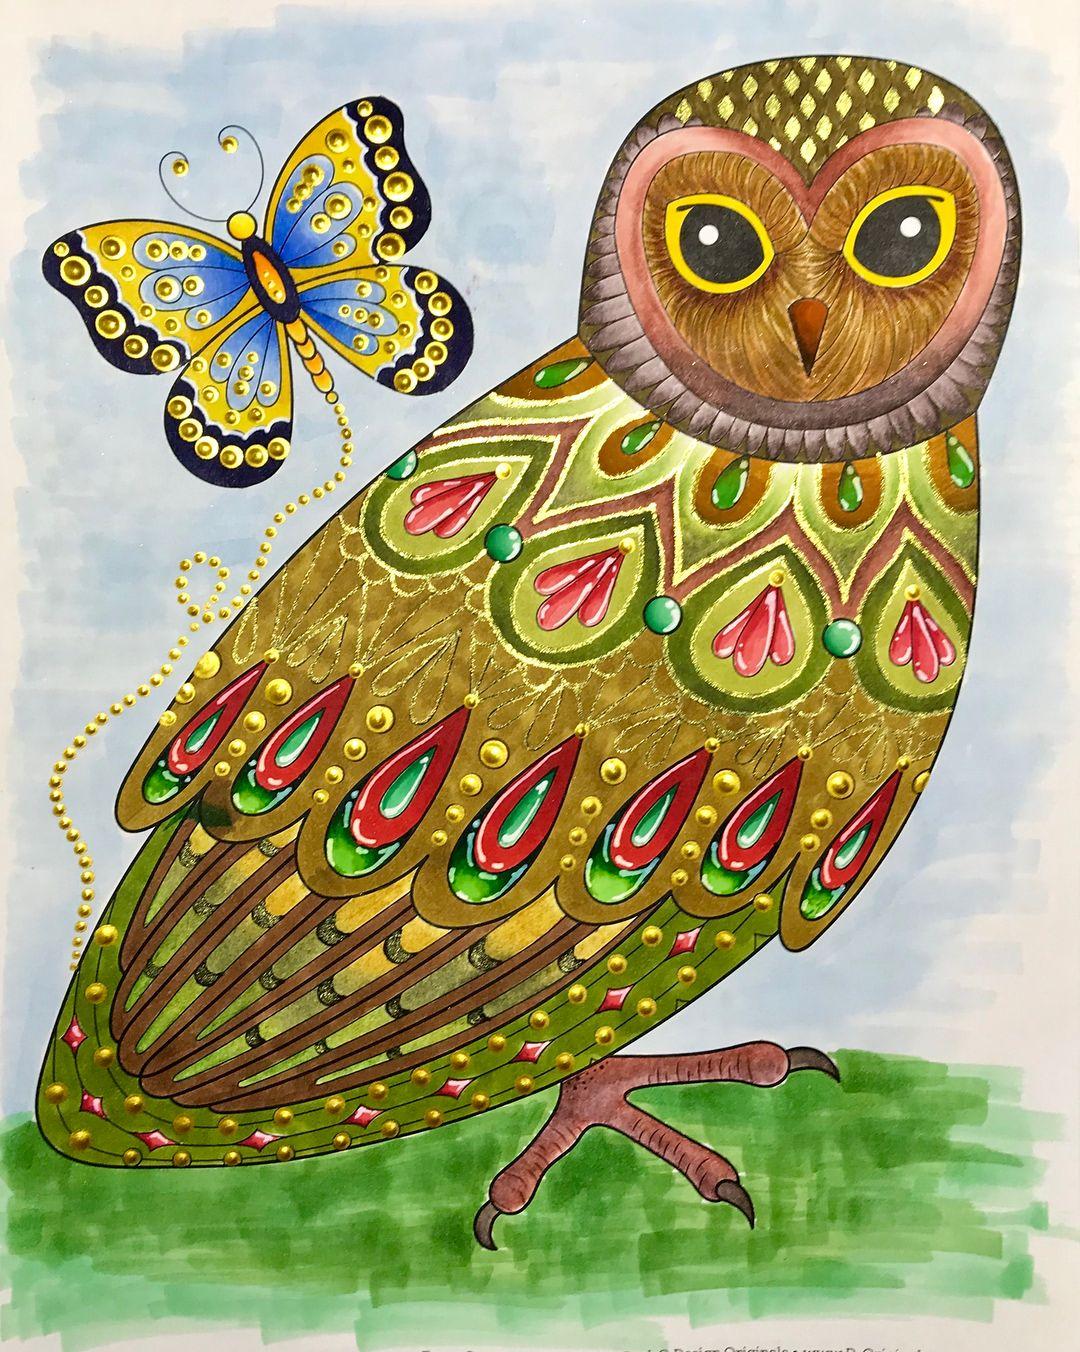 Owl From Thaneeya Mcardle S Groovy Owls Coloring Book Owl Coloring Pages Coloring Books Owl